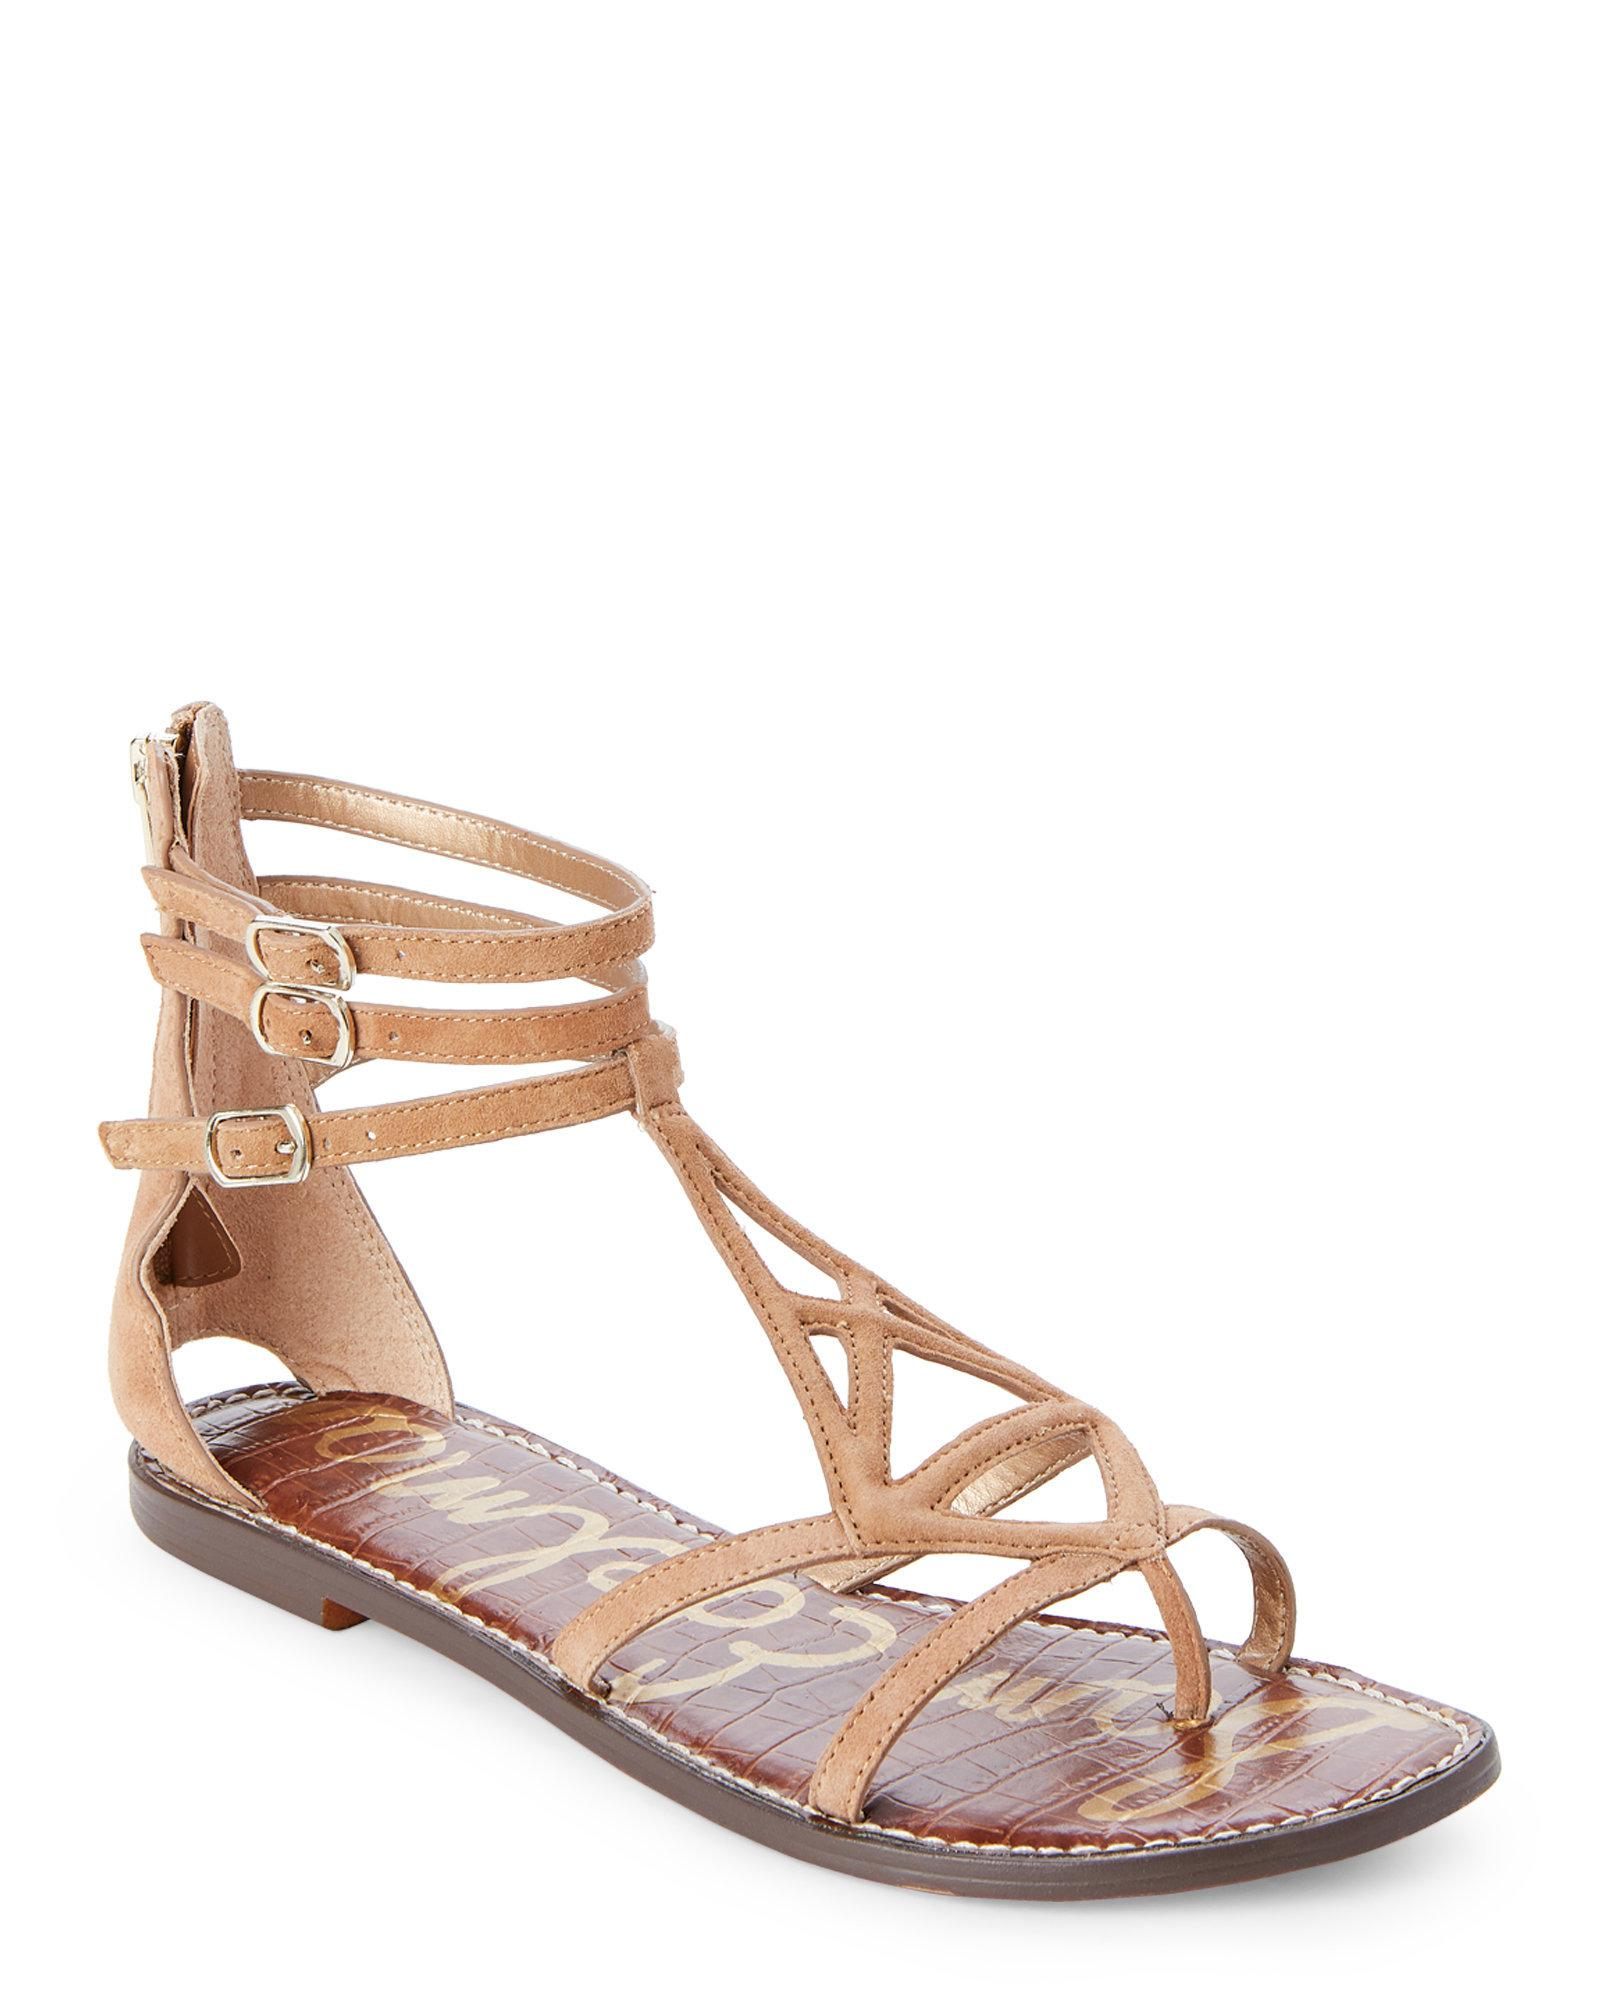 d5b8df7d7 Lyst - Sam Edelman Gold Caramel Goldie Flat Gladiator Sandals